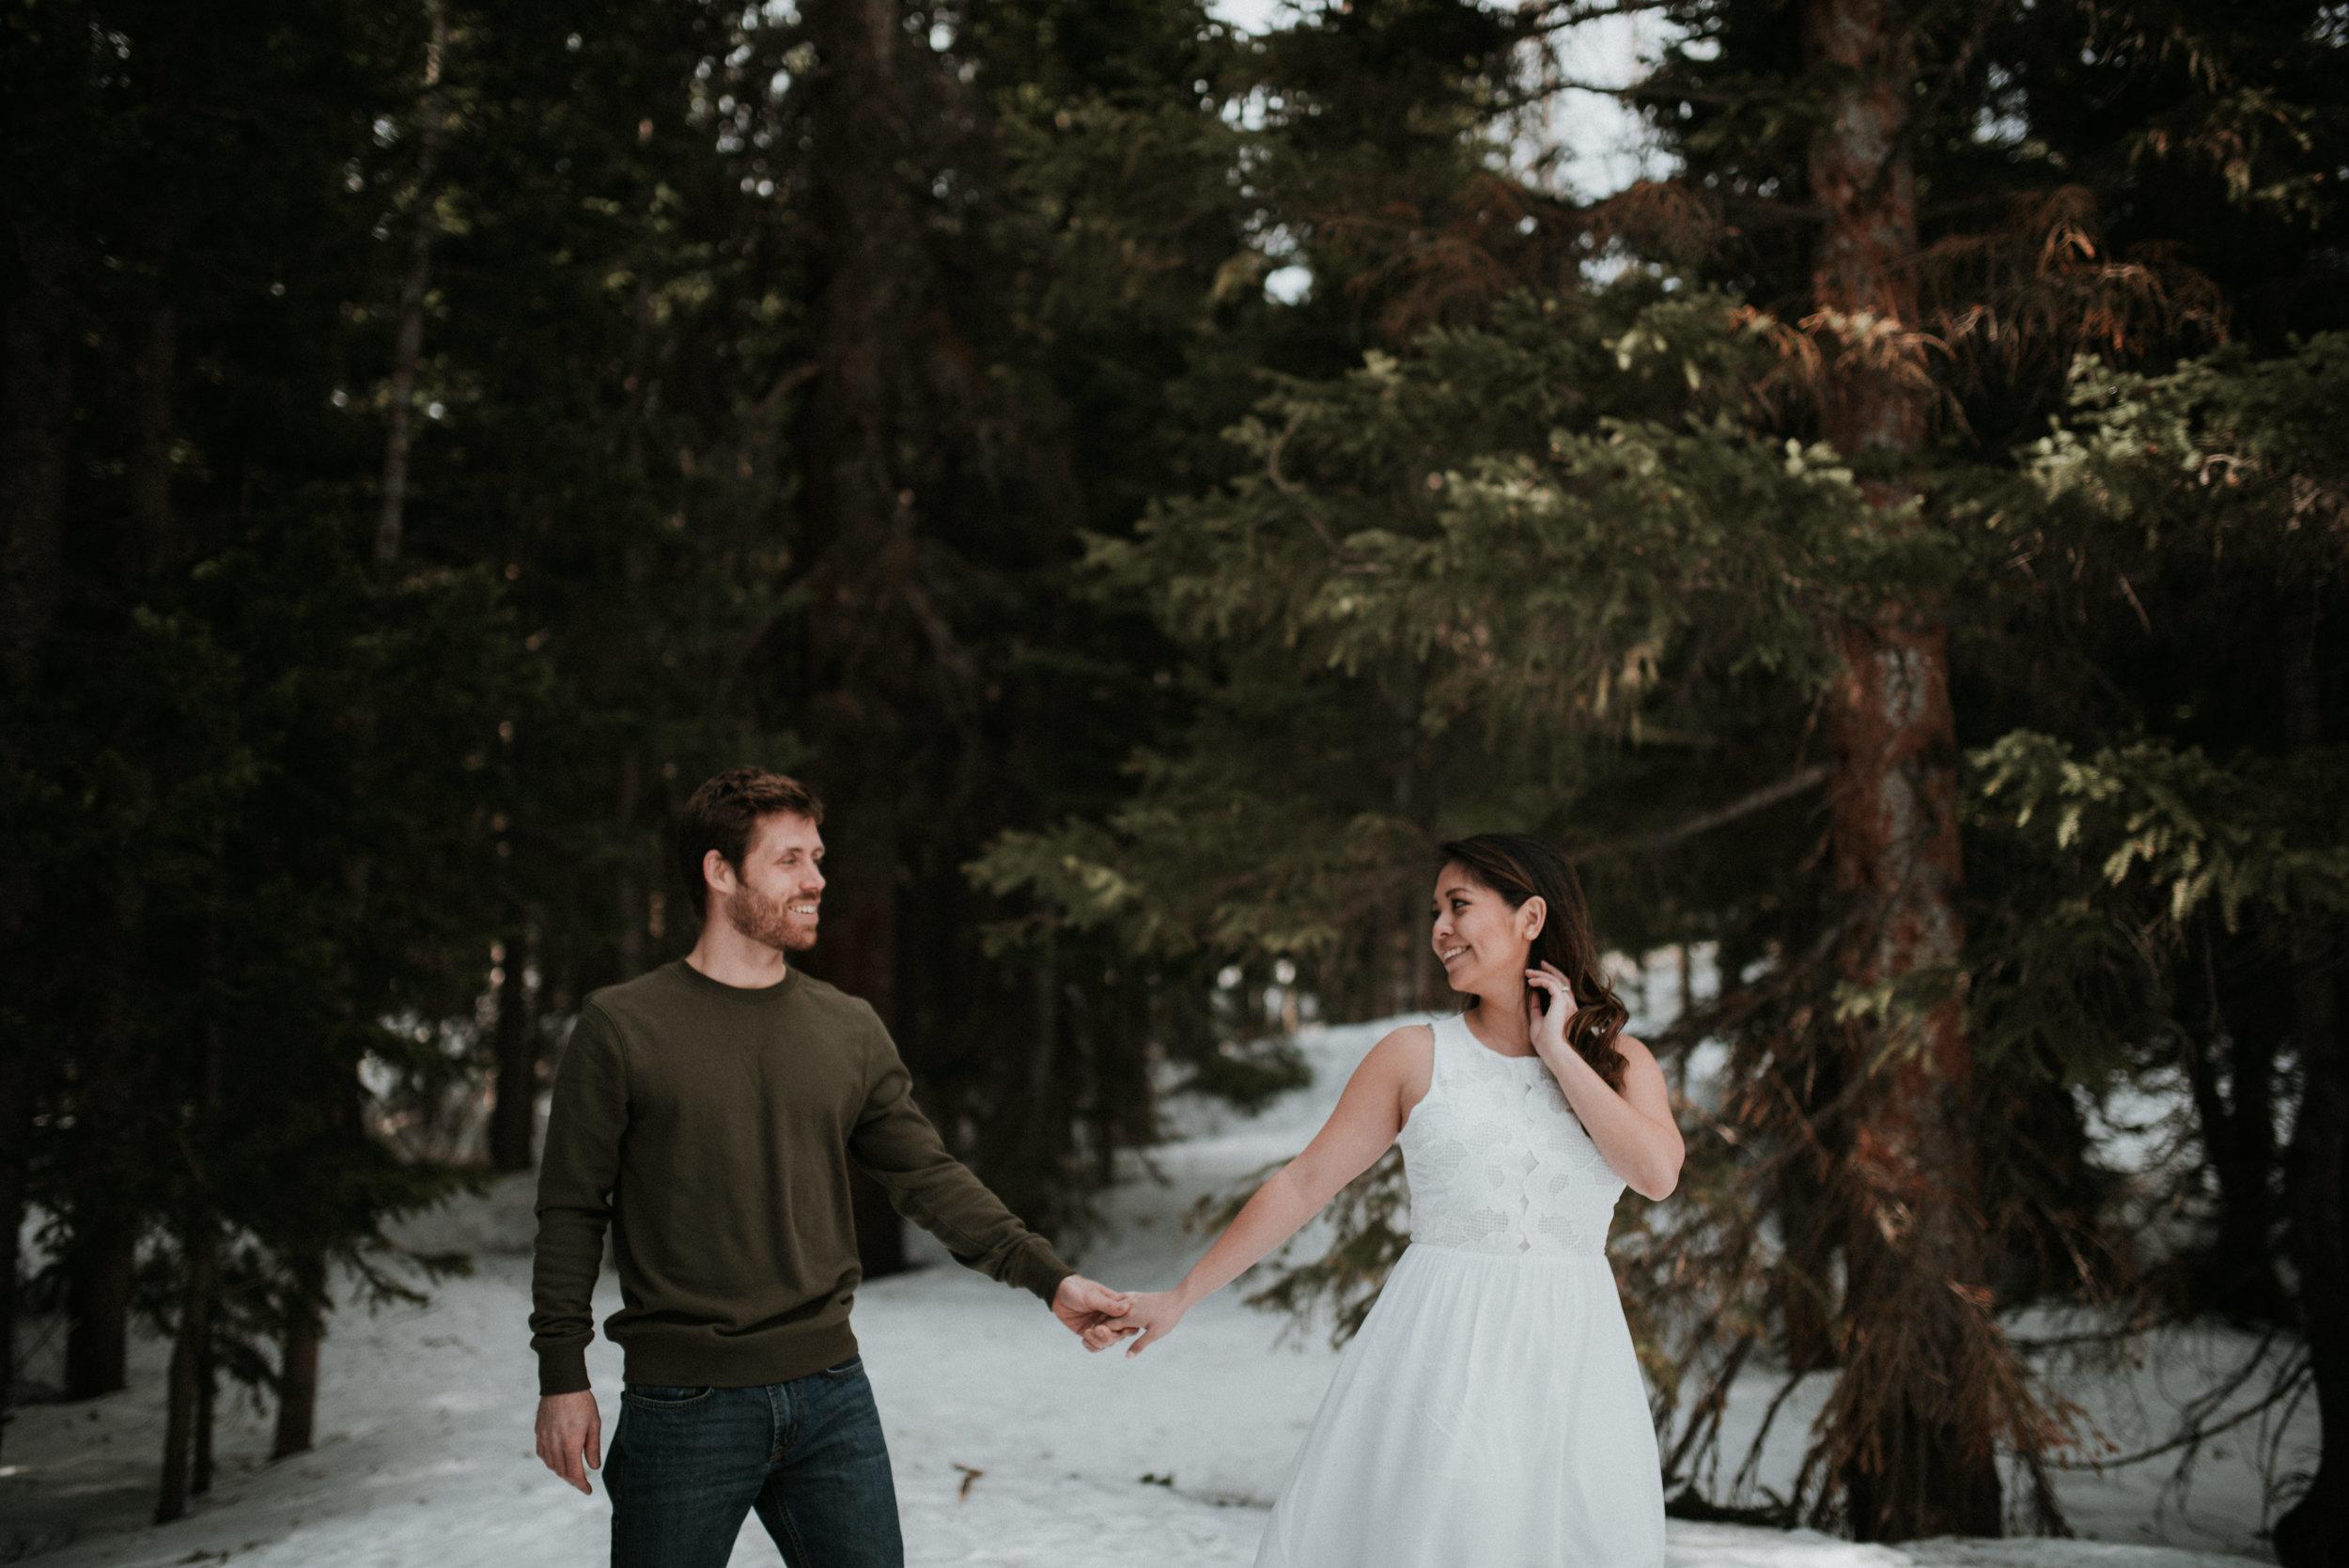 Zach&Rosalie Rocky Mountain National Park Engagement Denver Colorado Rocky Mountain Wedding Photographer00006.jpg